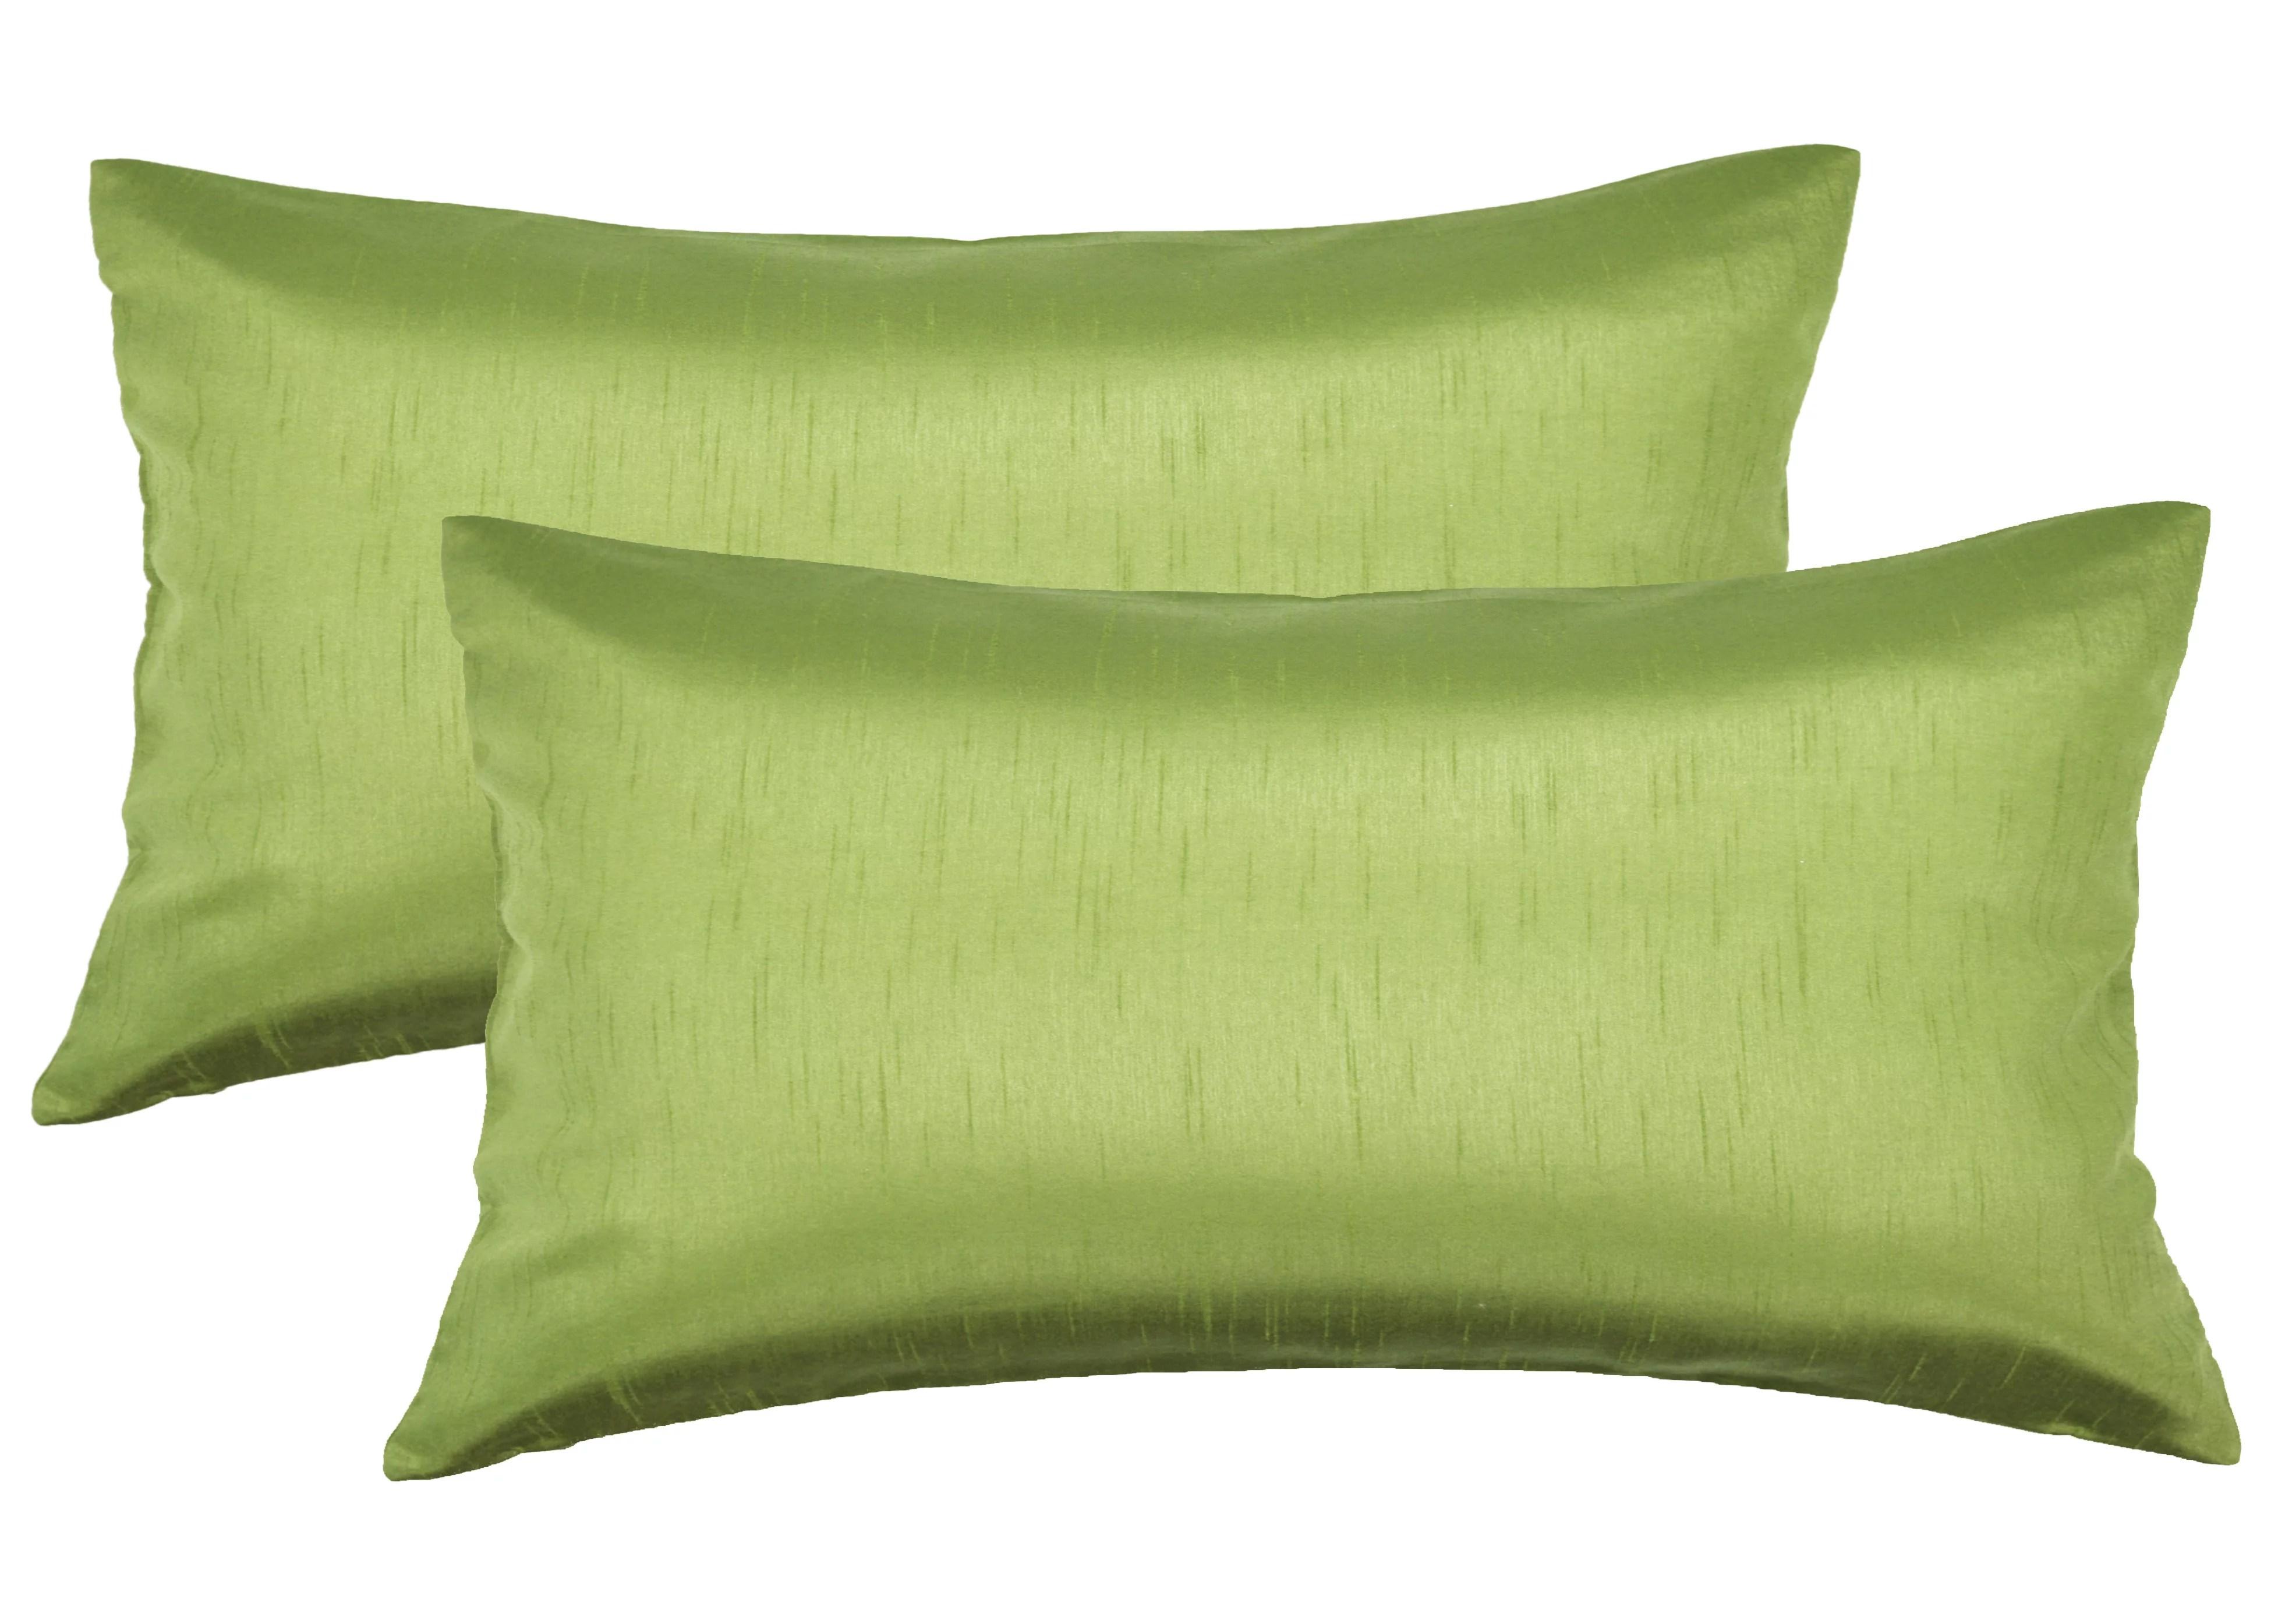 aiking home 12x24 inches faux silk rectangular throw pillow cover zipper closure green set of 2 walmart com